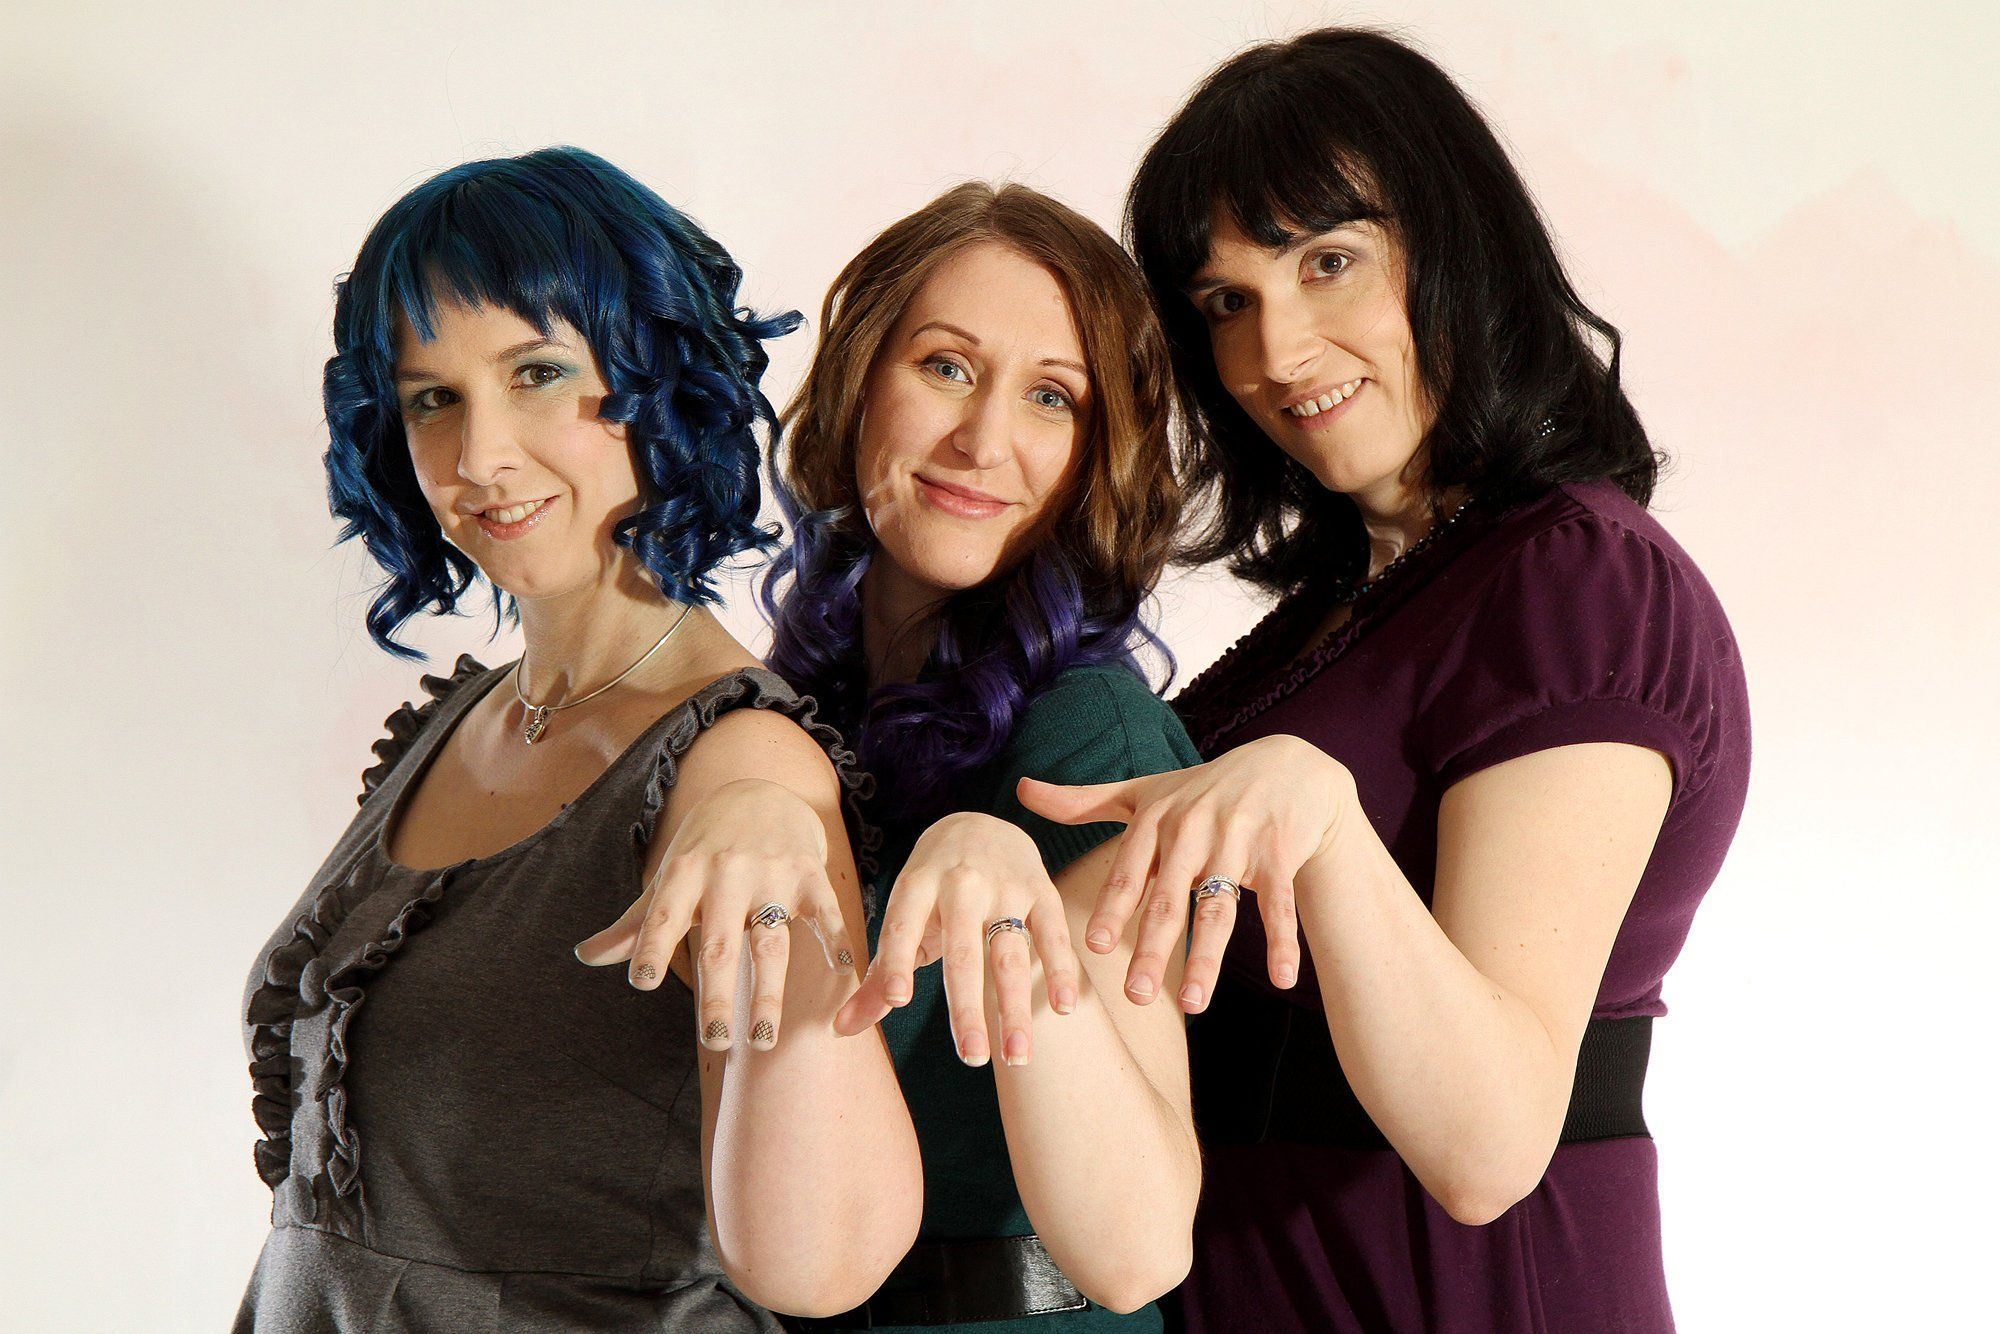 Three college lesbians